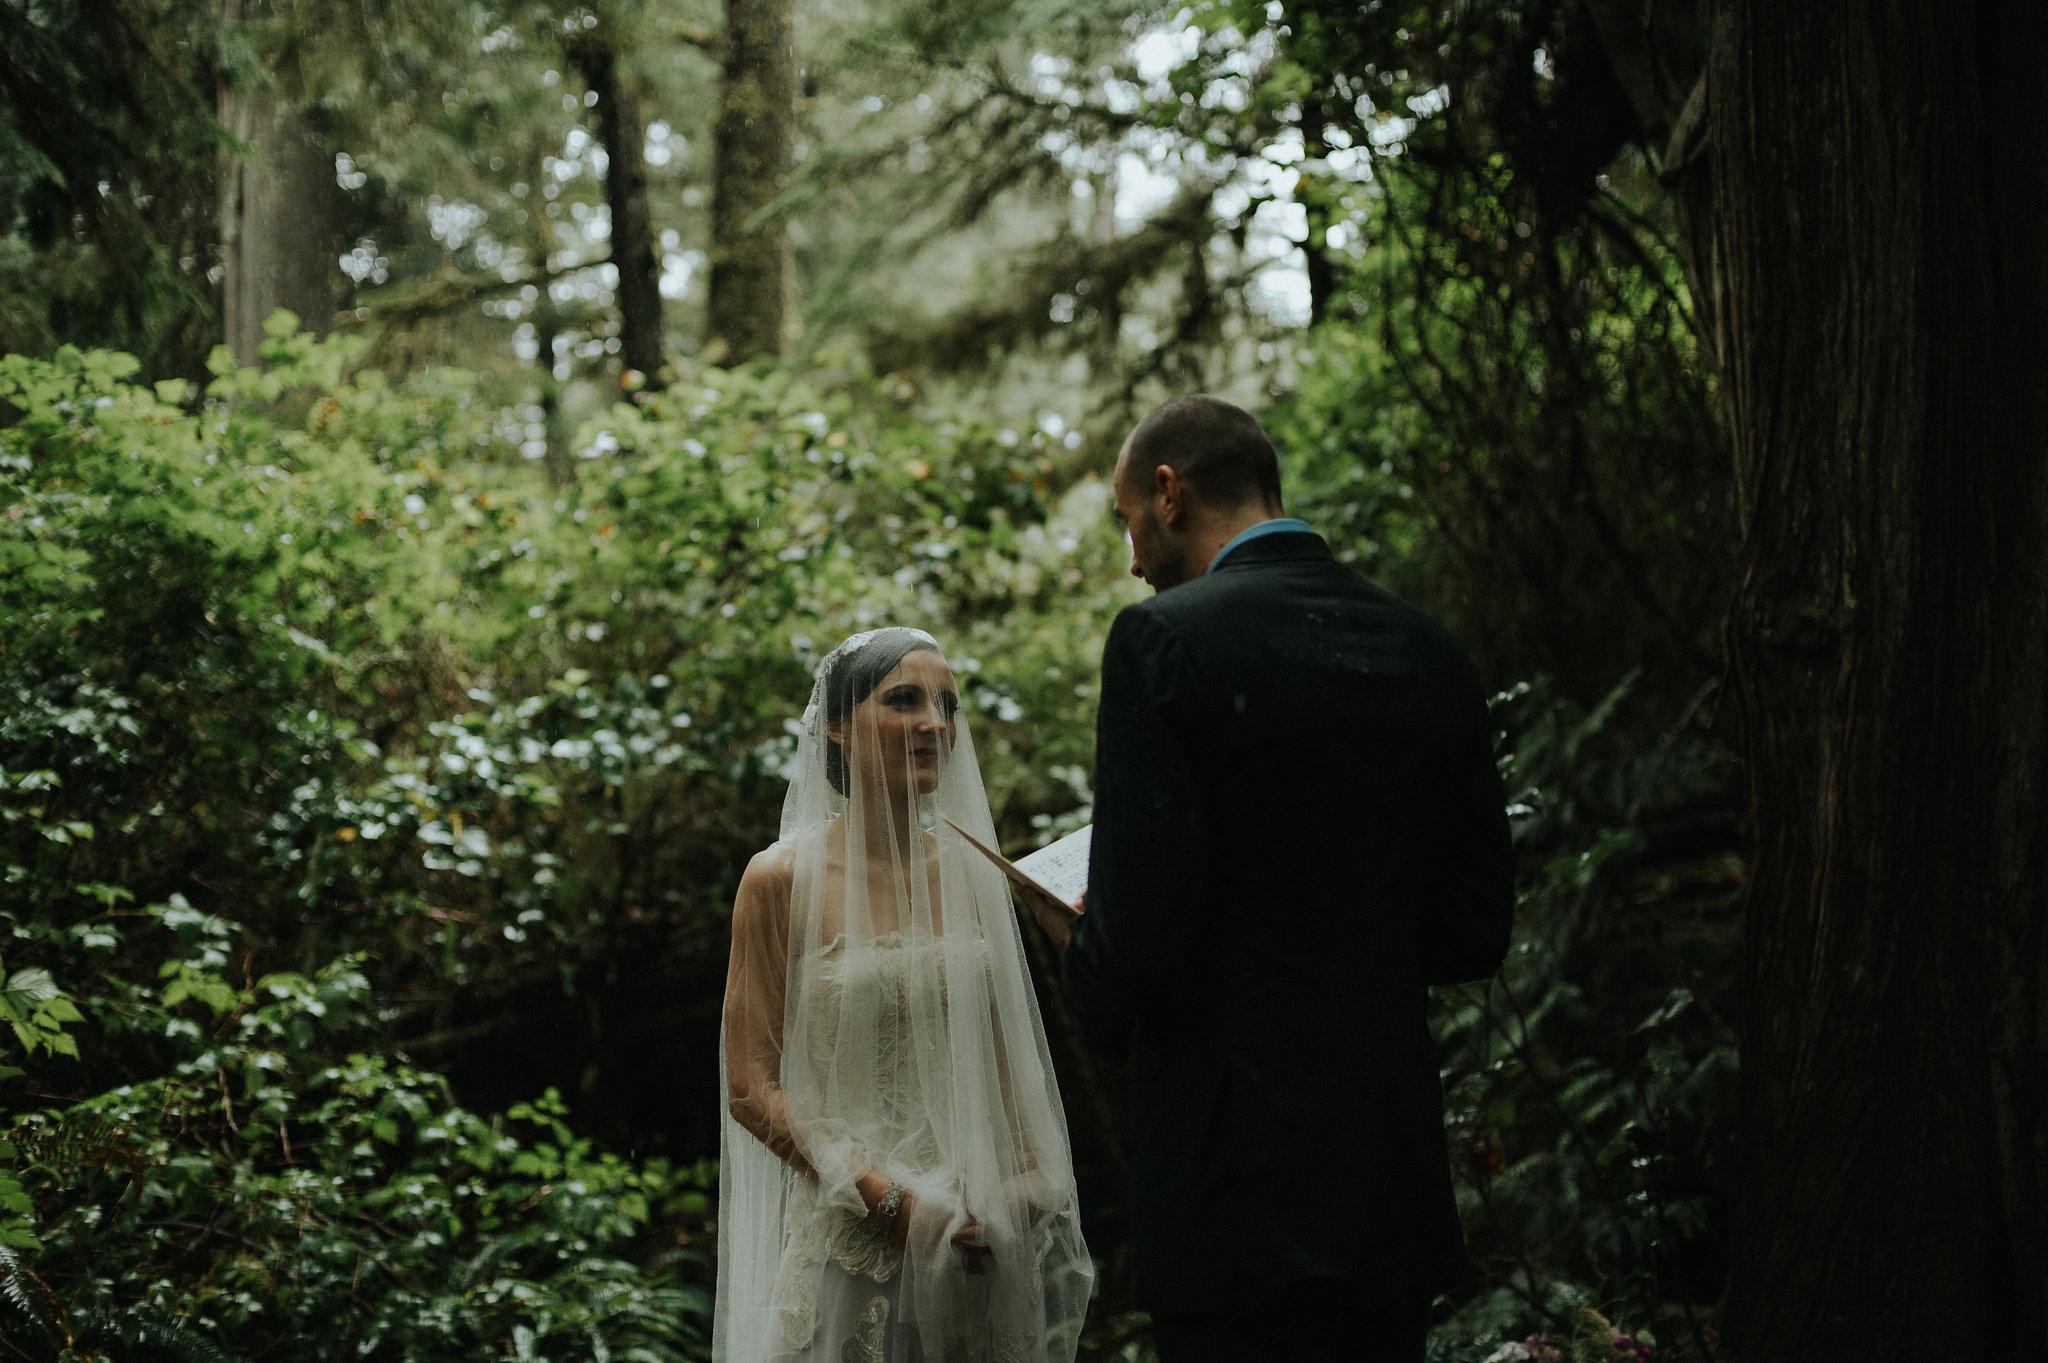 Dreamy Tofino elopement at Pacific Rim National Park by destination wedding photographer Daring Wanderer // www.daringwanderer.com